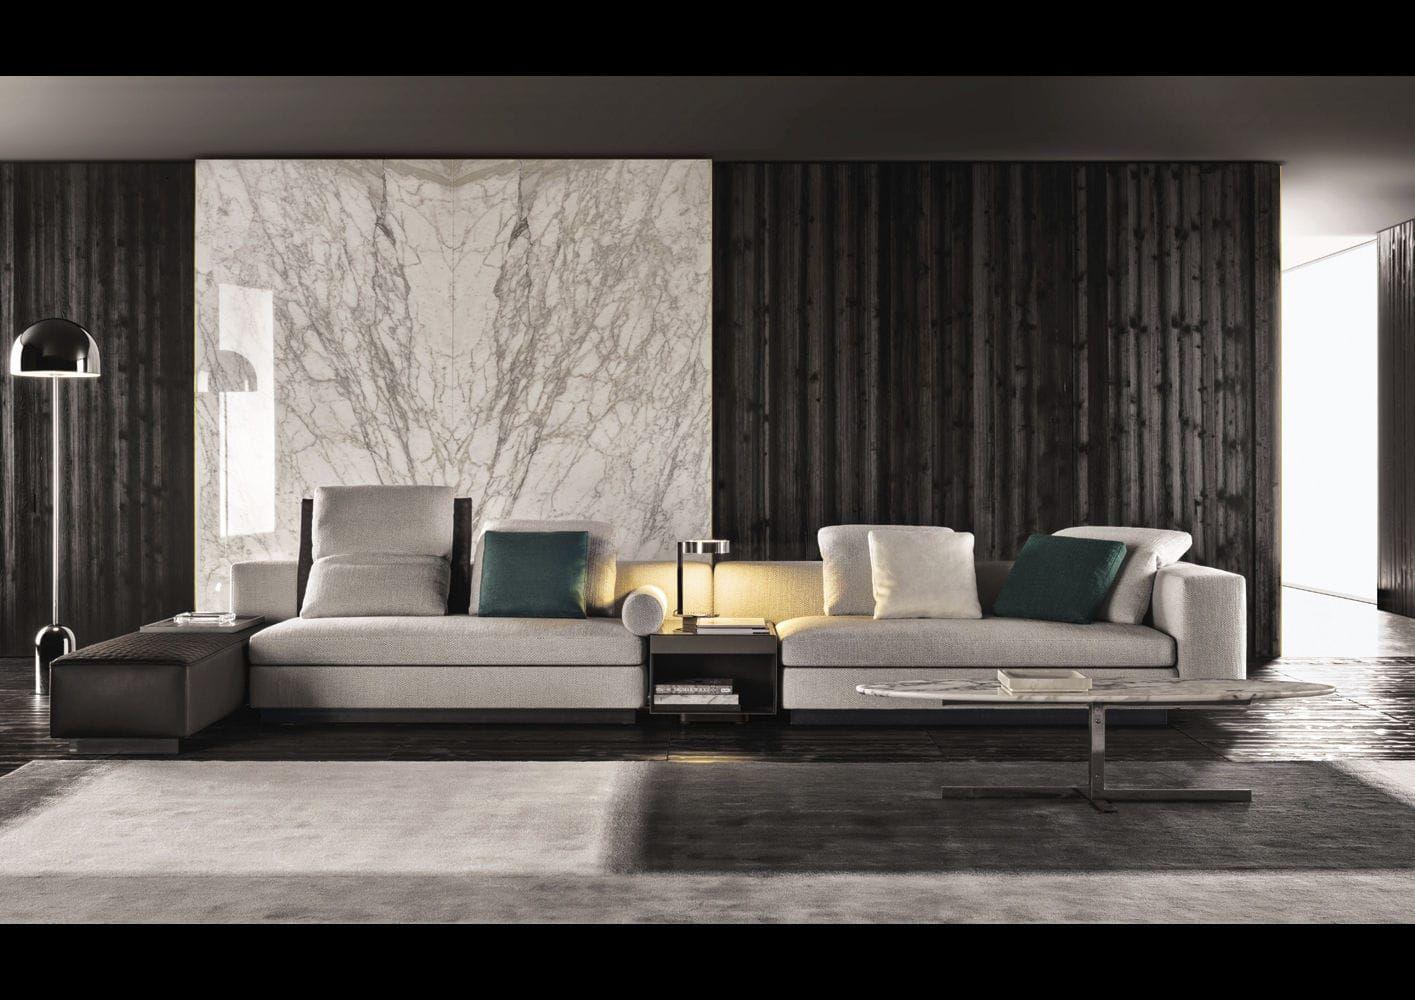 Modular Living Room Furniture Modular Sofa Contemporary Fabric By Rodolfo Dordoni Yang